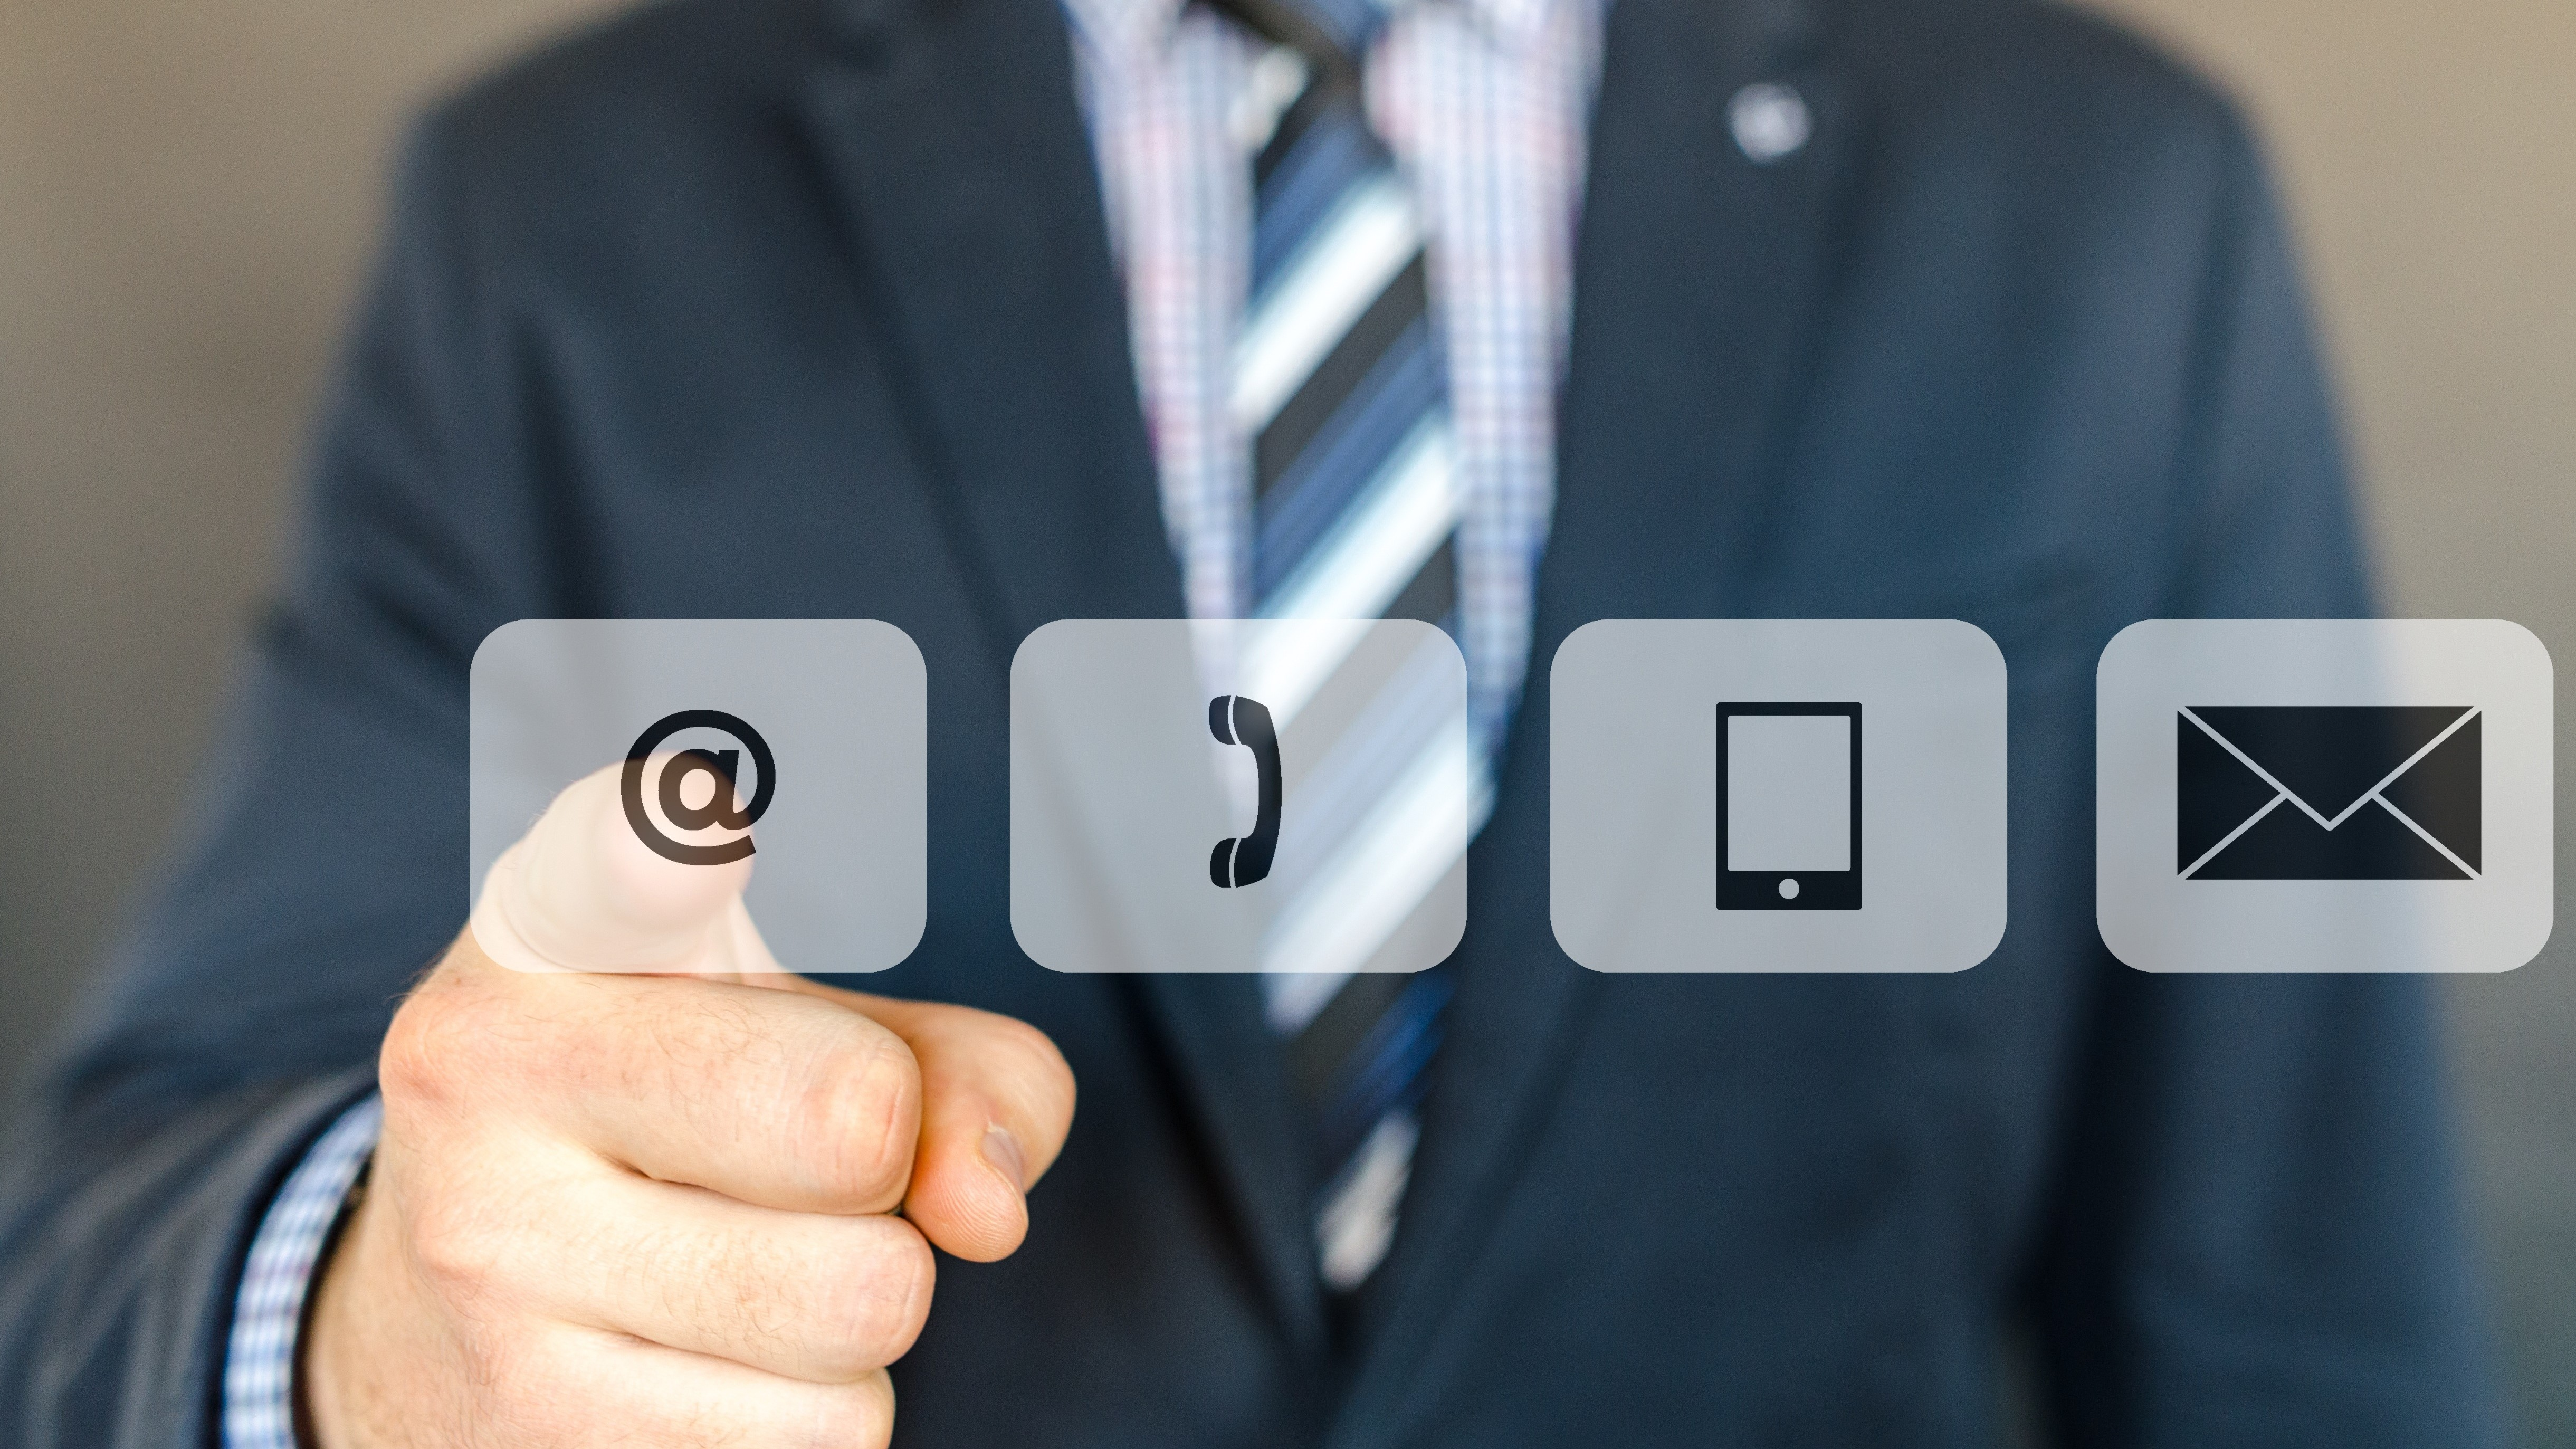 Best CPaaS of 2020: Communications Platform as a Service providers |  TechRadar